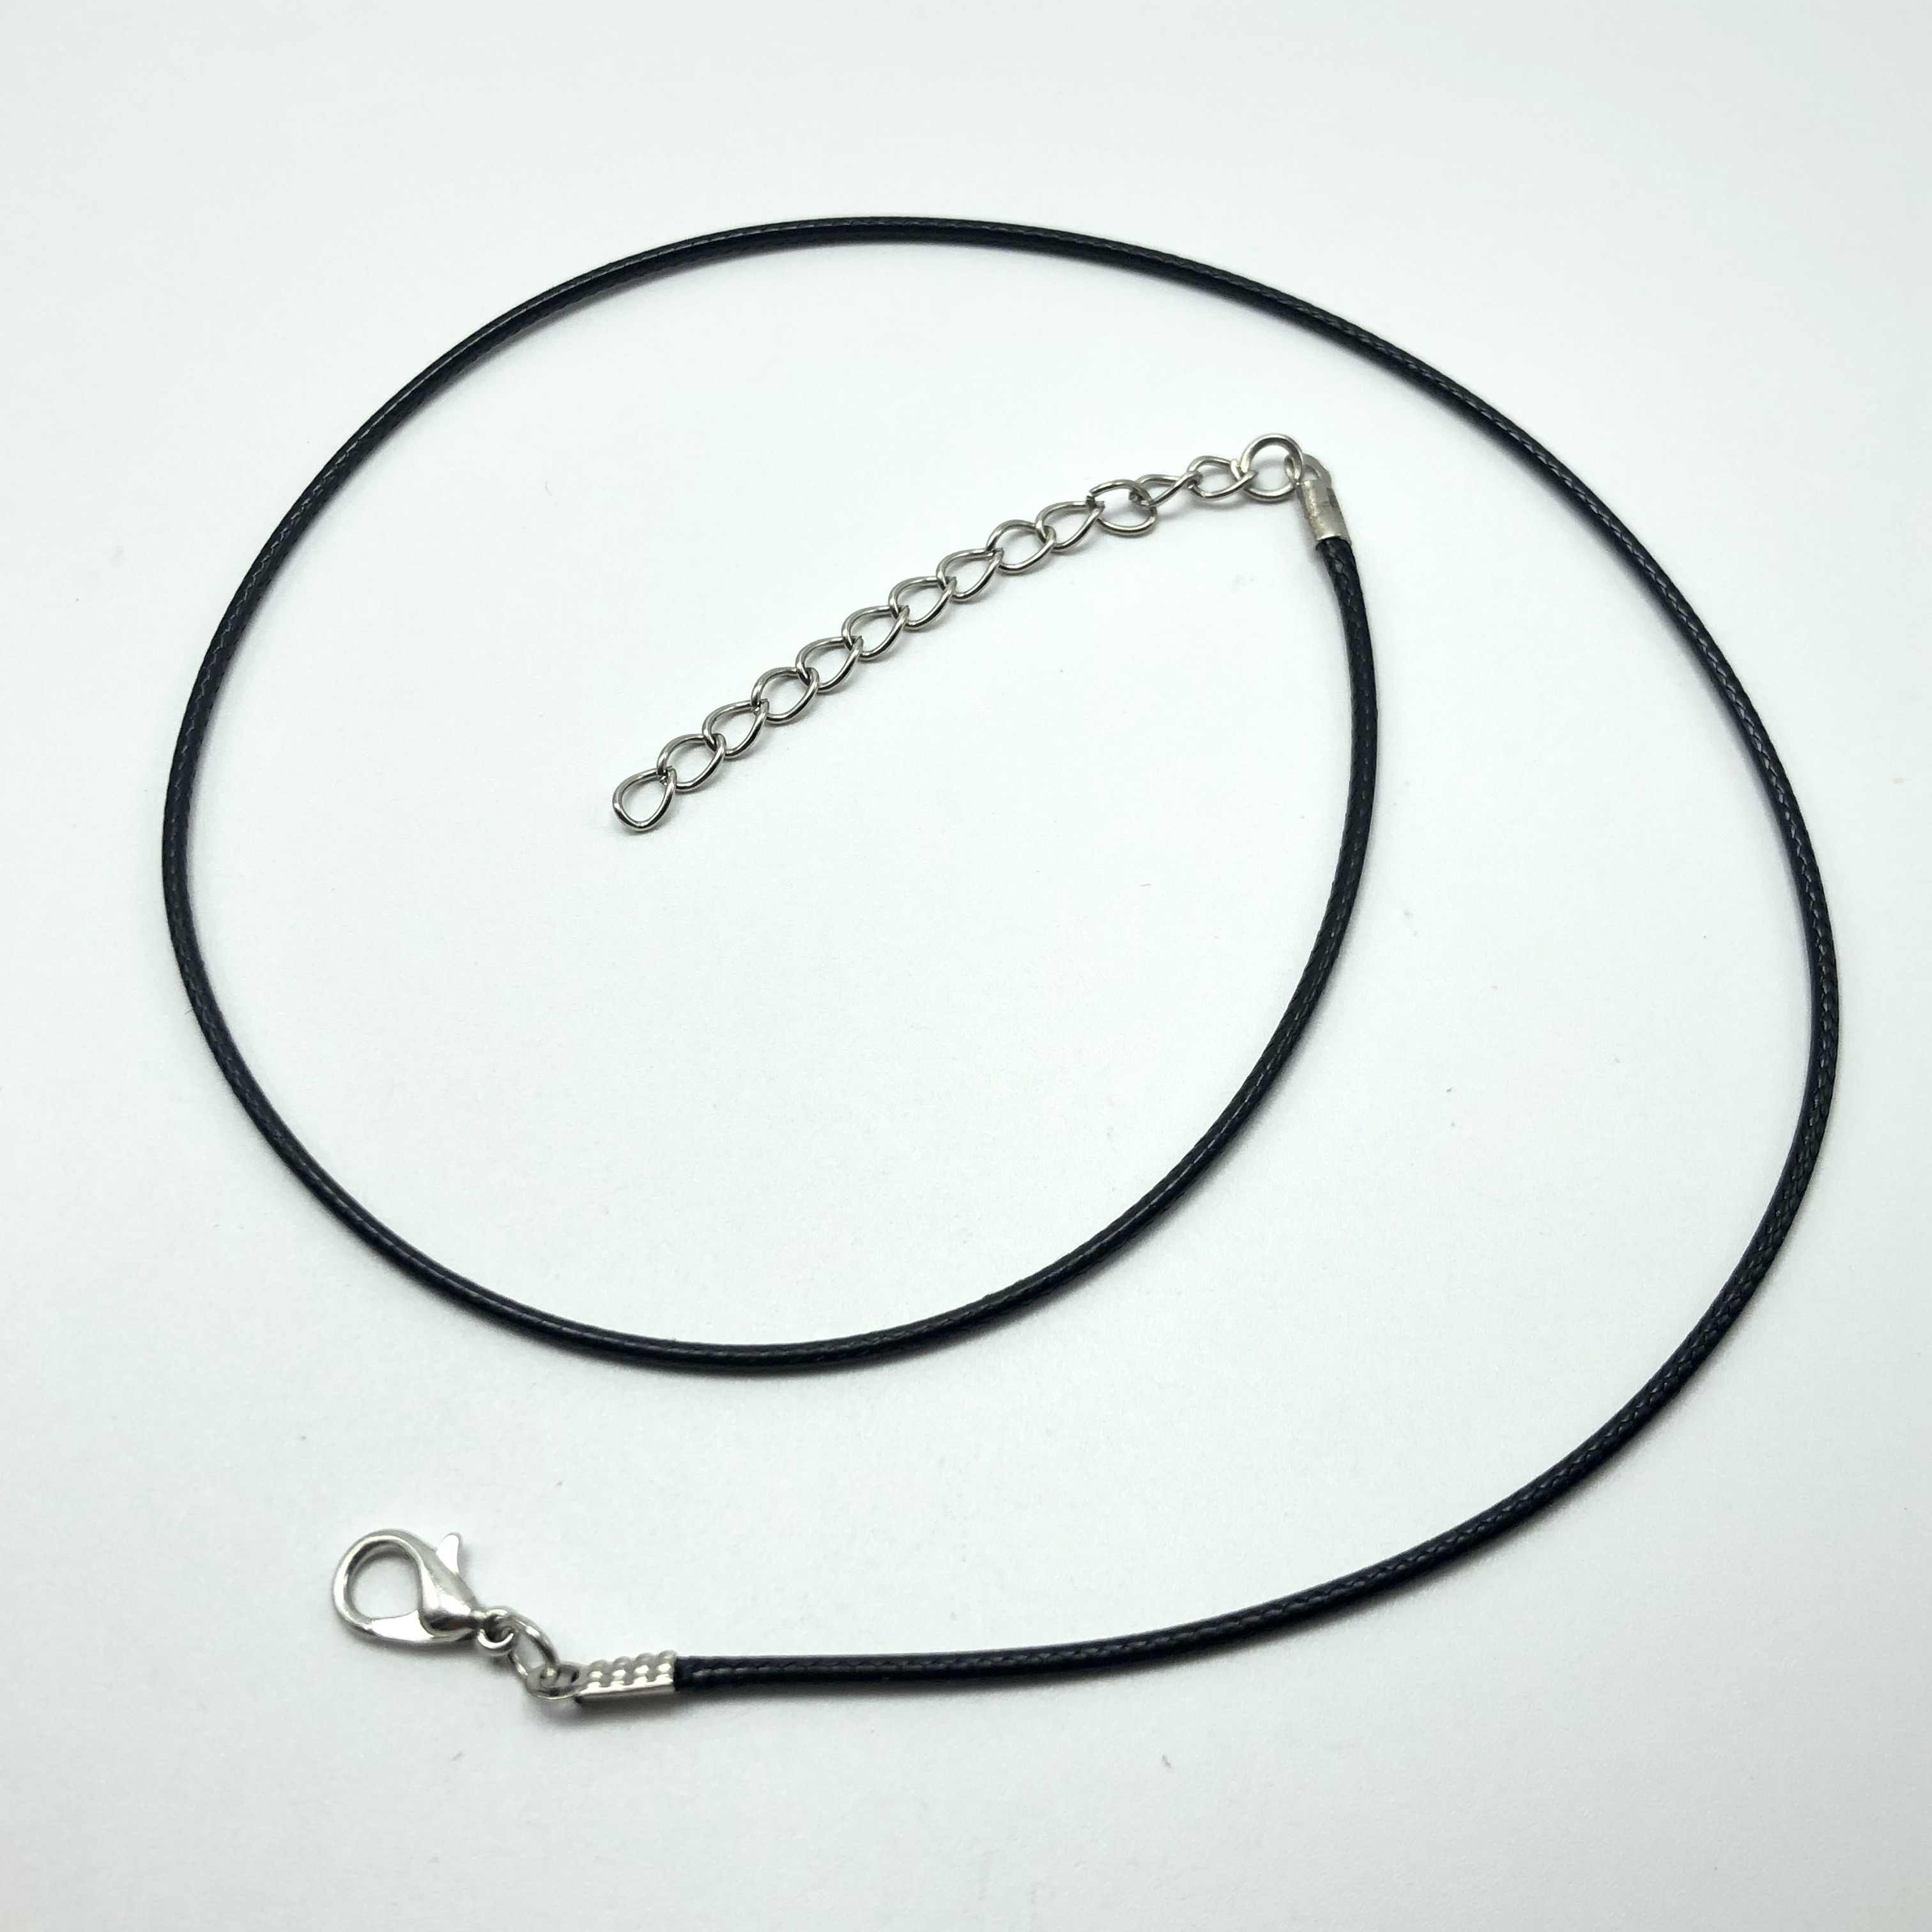 Wholesale 2mm Leather Cord Lobster Clasp Pendant Necklace Chains 10pcs